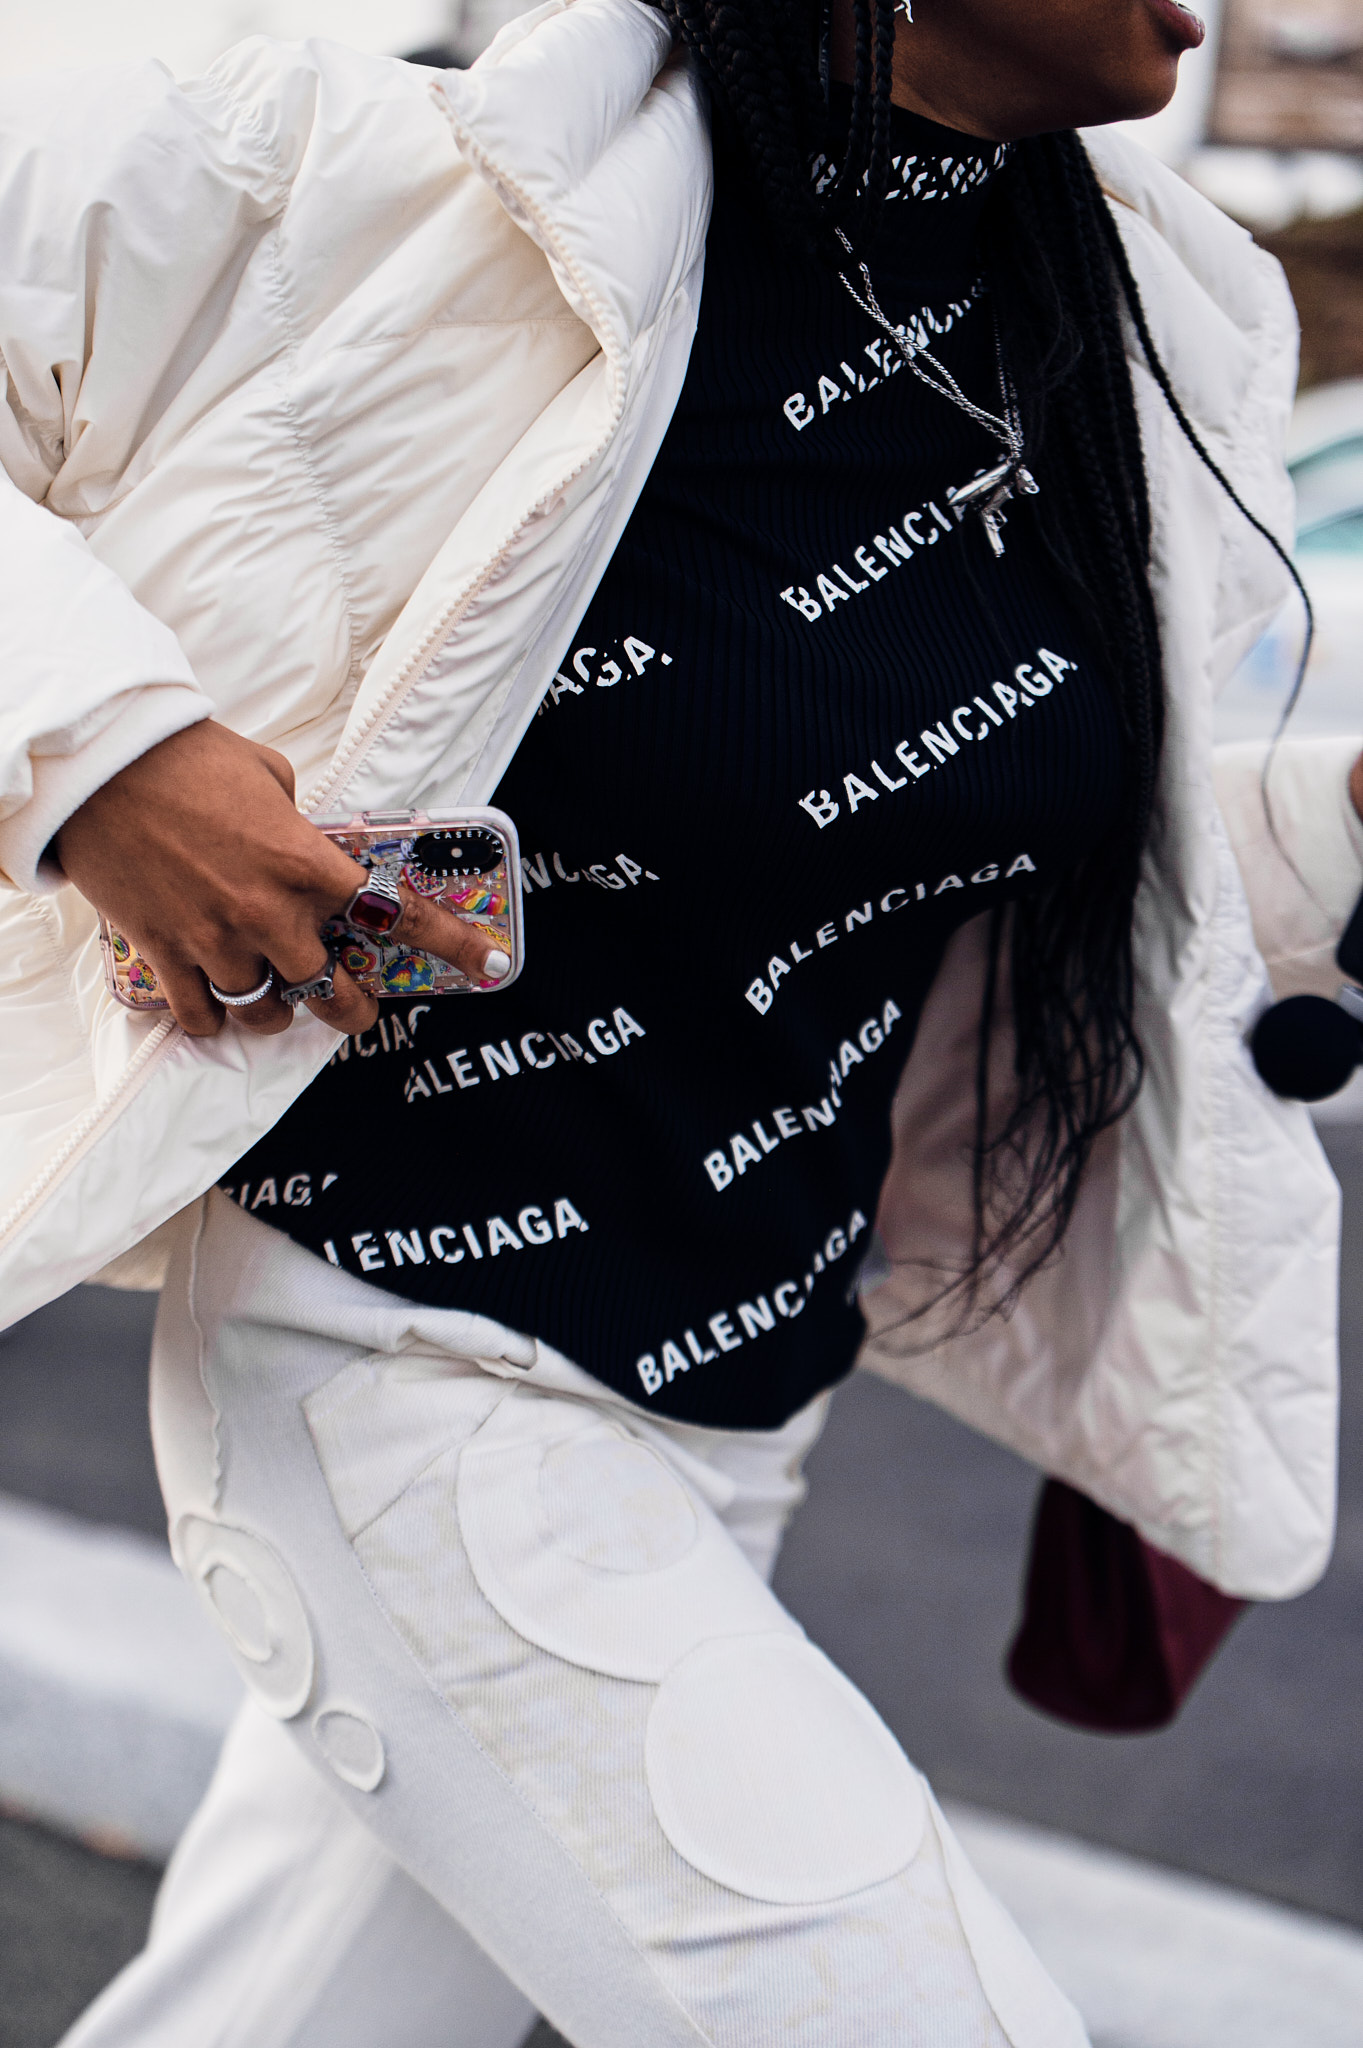 Outside Prada - Milan Fashion Week SS20